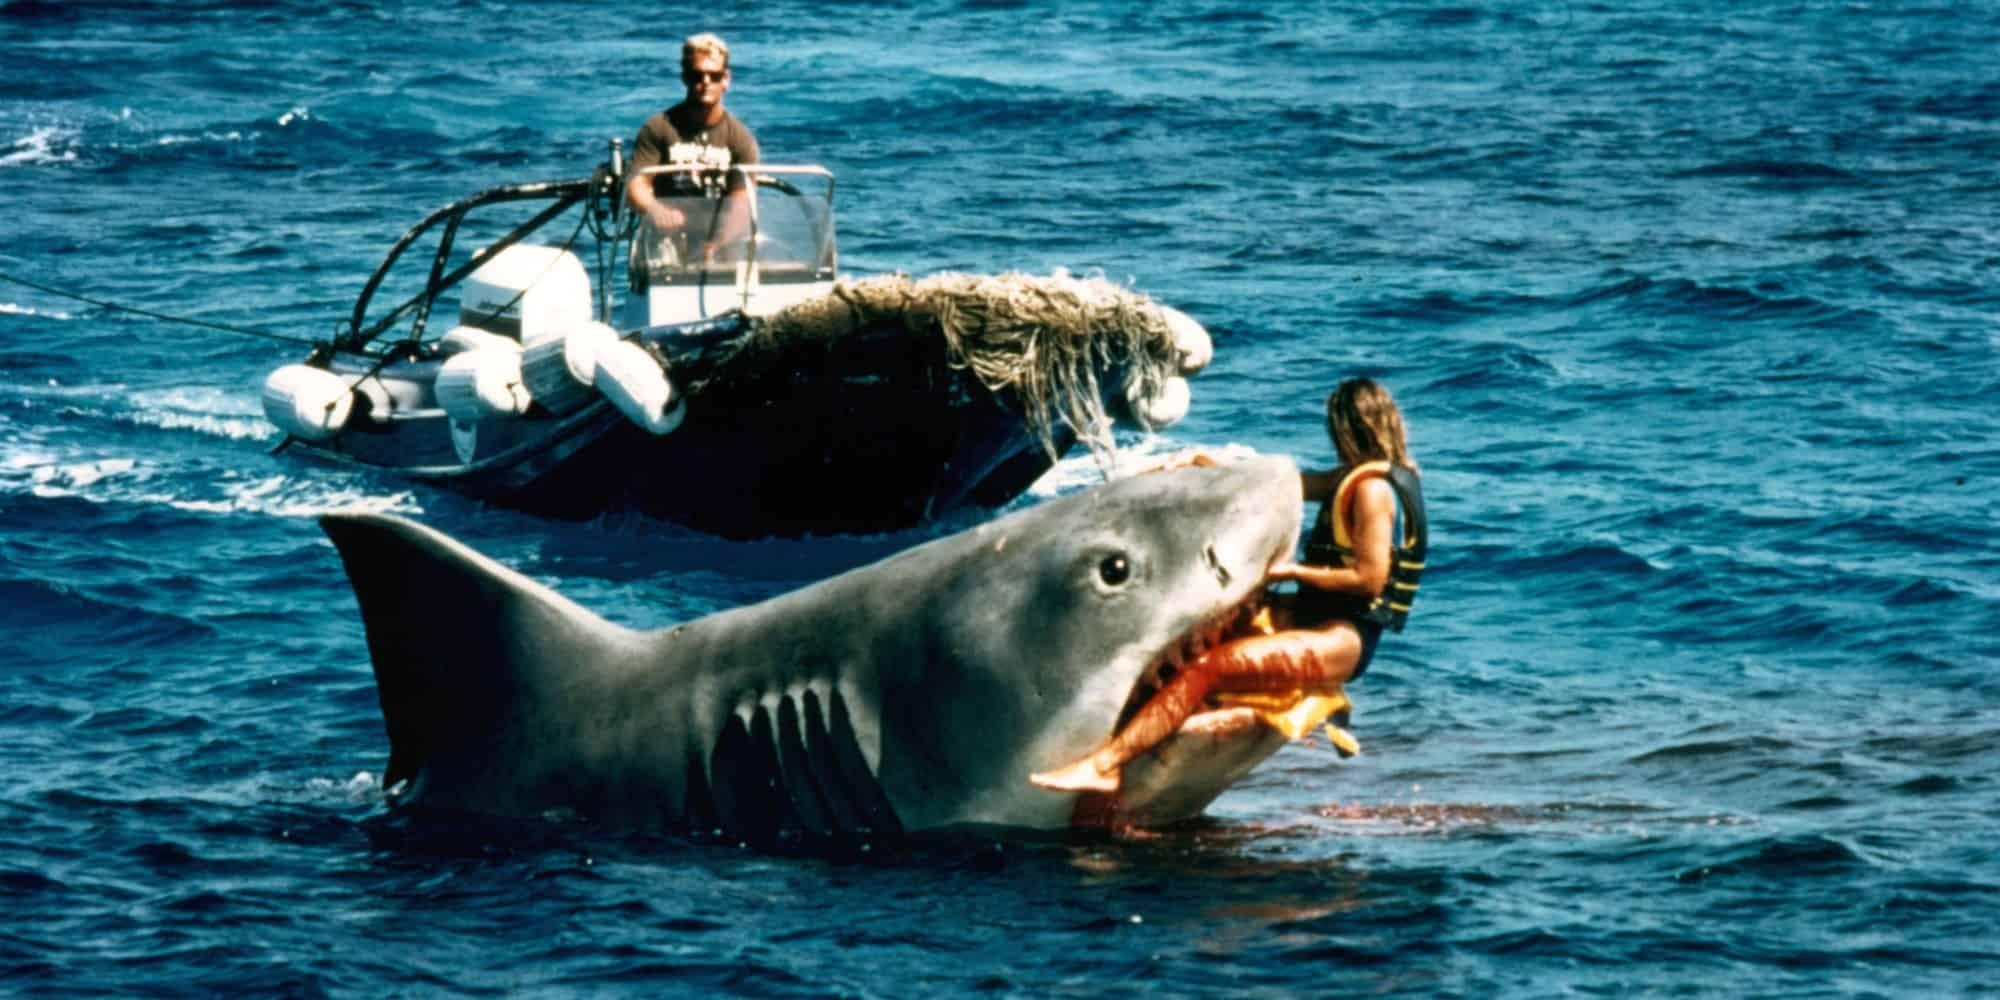 o-JAWS-MOVIE-facebook.jpg?fit=2000%2C1000&ssl=1